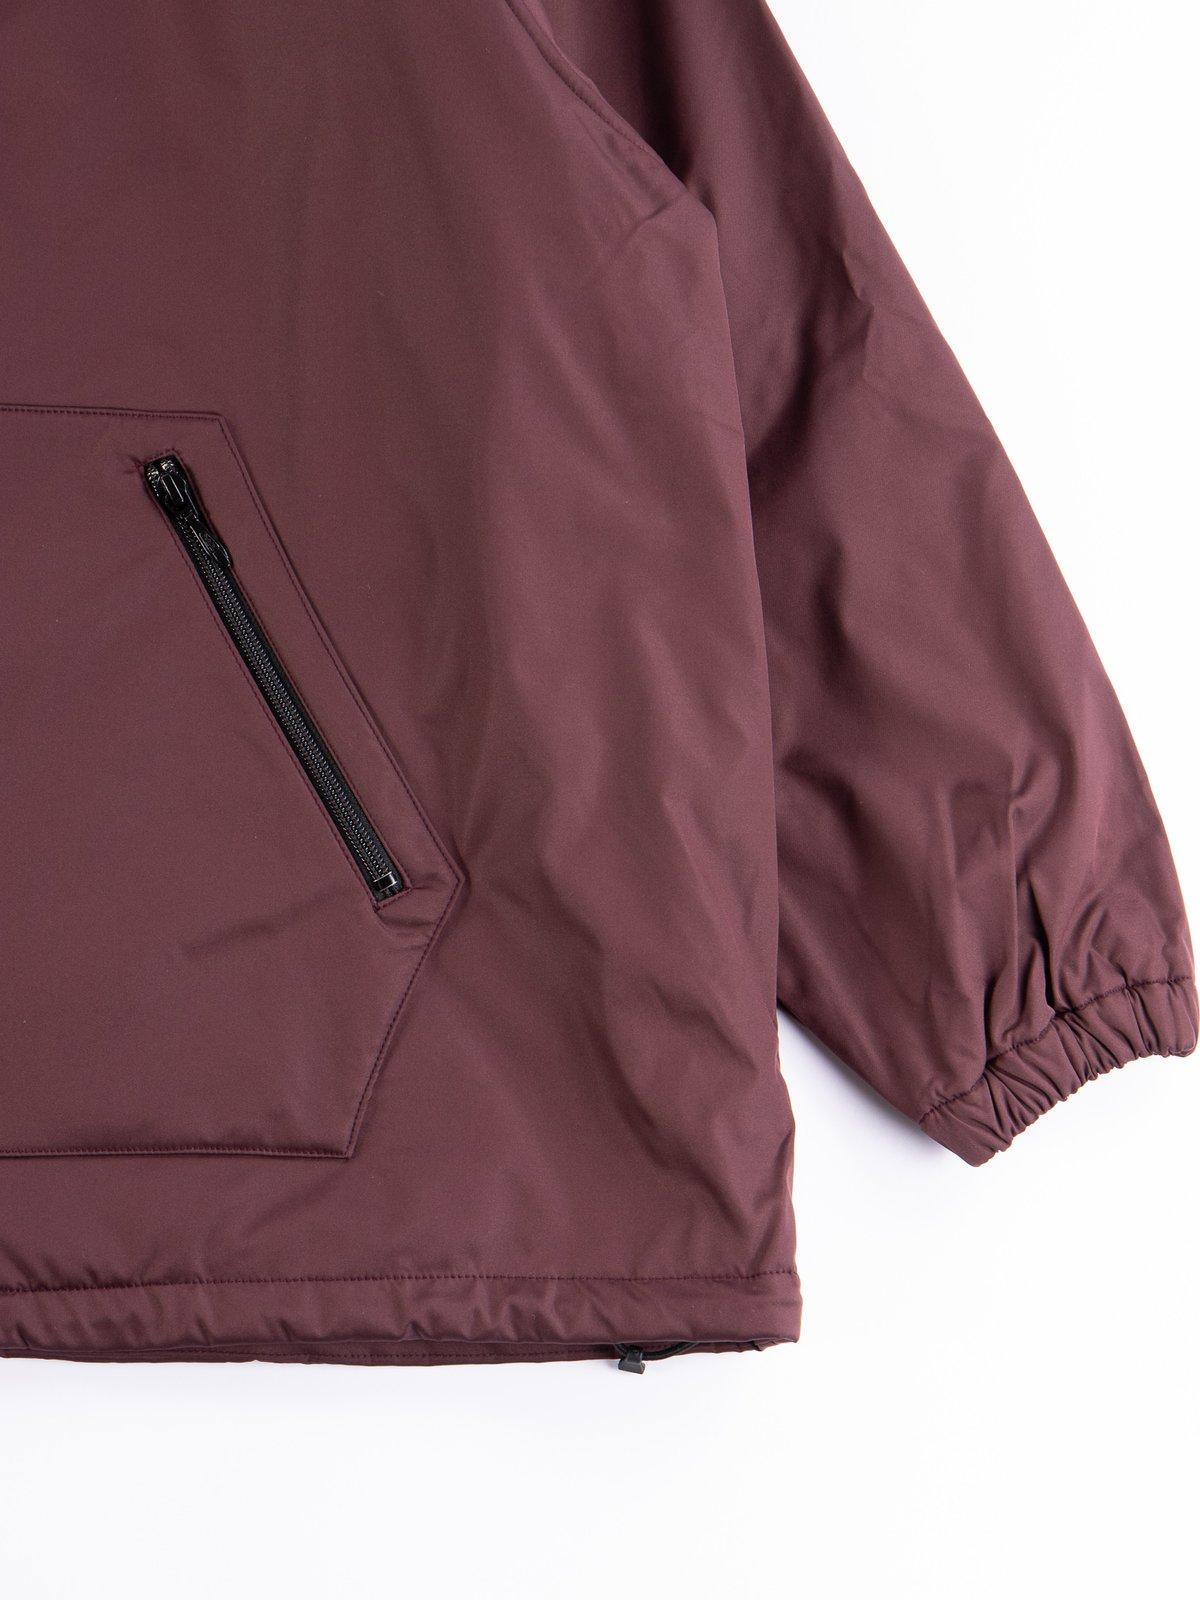 Bordeaux Jog Jacket - Image 4